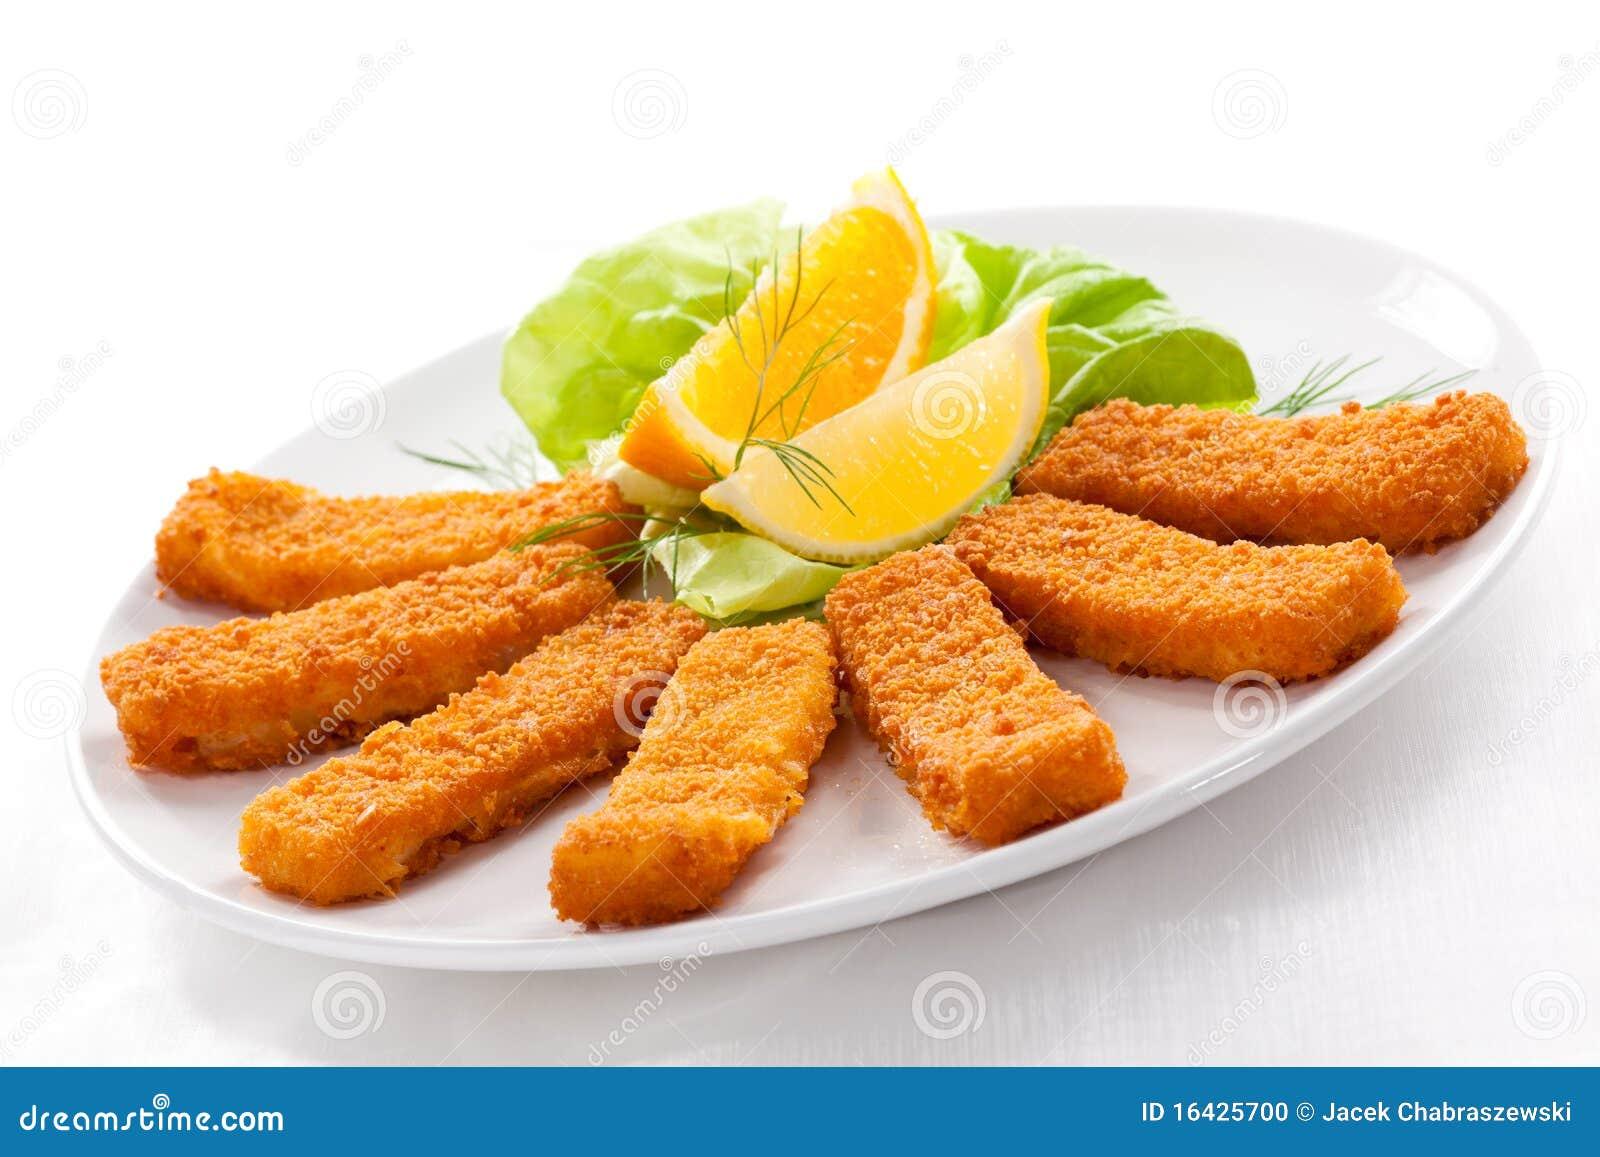 fried fish fingers stock photo image 16425700